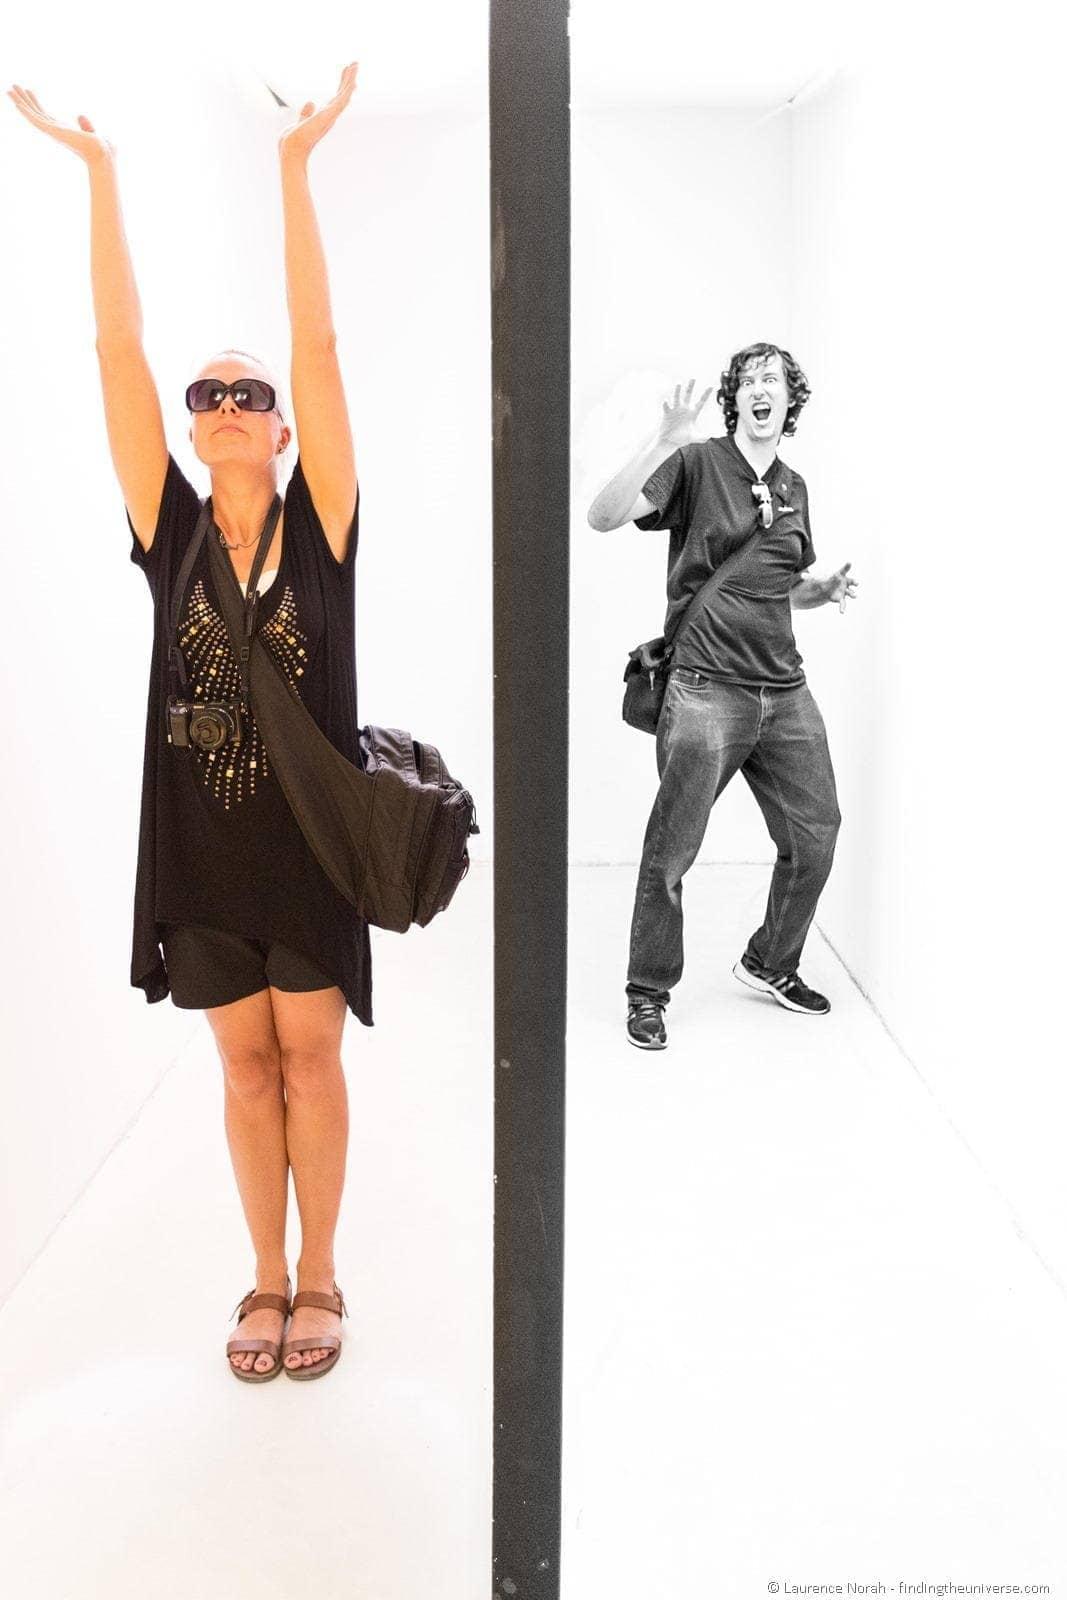 novecento museum milan modern art people dancing